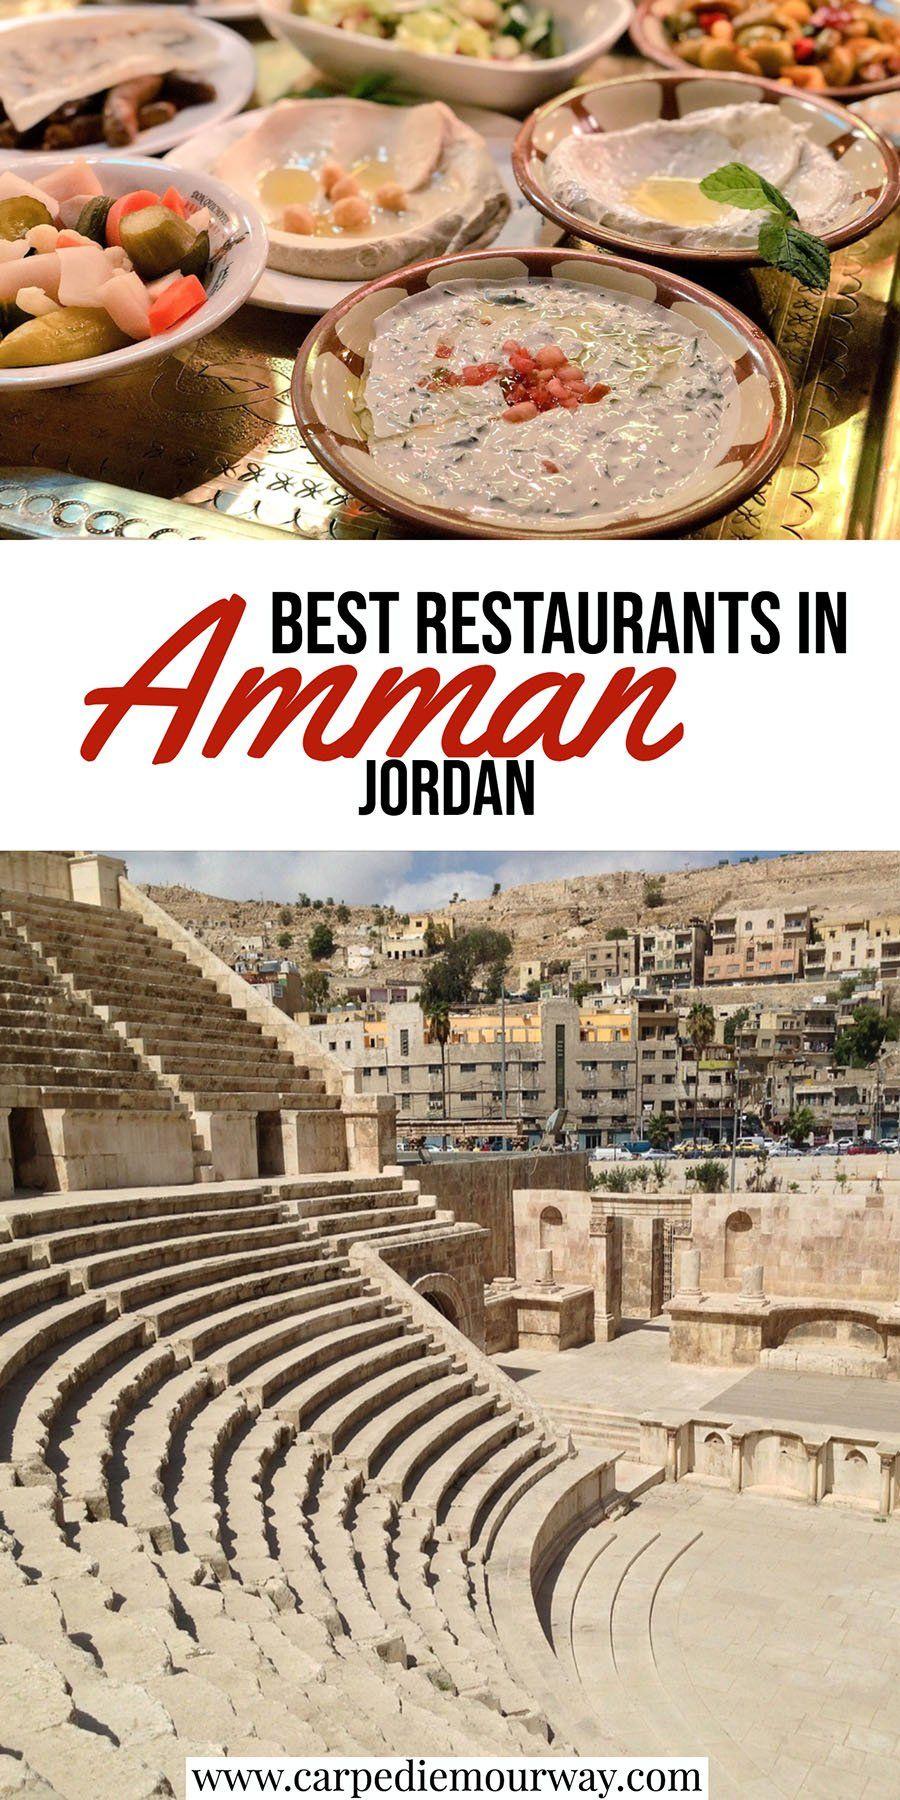 Best Restaurants in Amman Jordan | Carpe Diem OUR Way Travel #ammanjordan